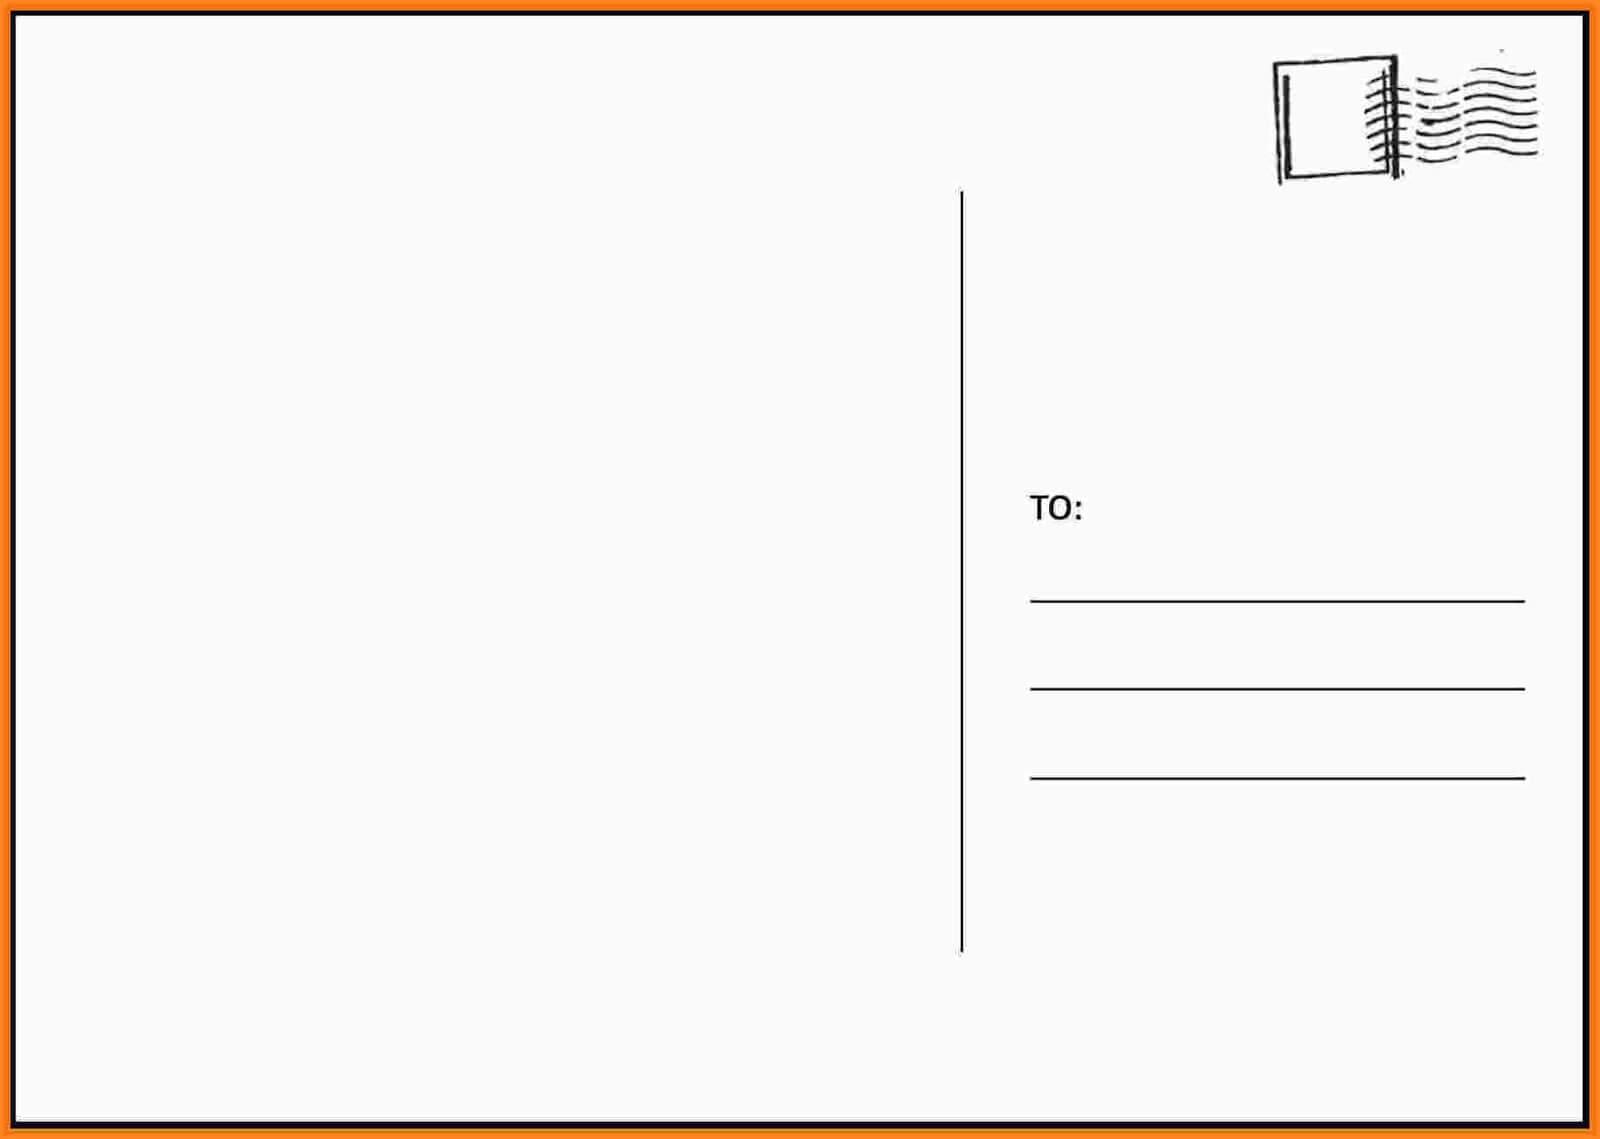 004 Free2Bprintable2Bpostcard2Btemplates2Bfree Free Postcard Intended For Free Blank Postcard Template For Word